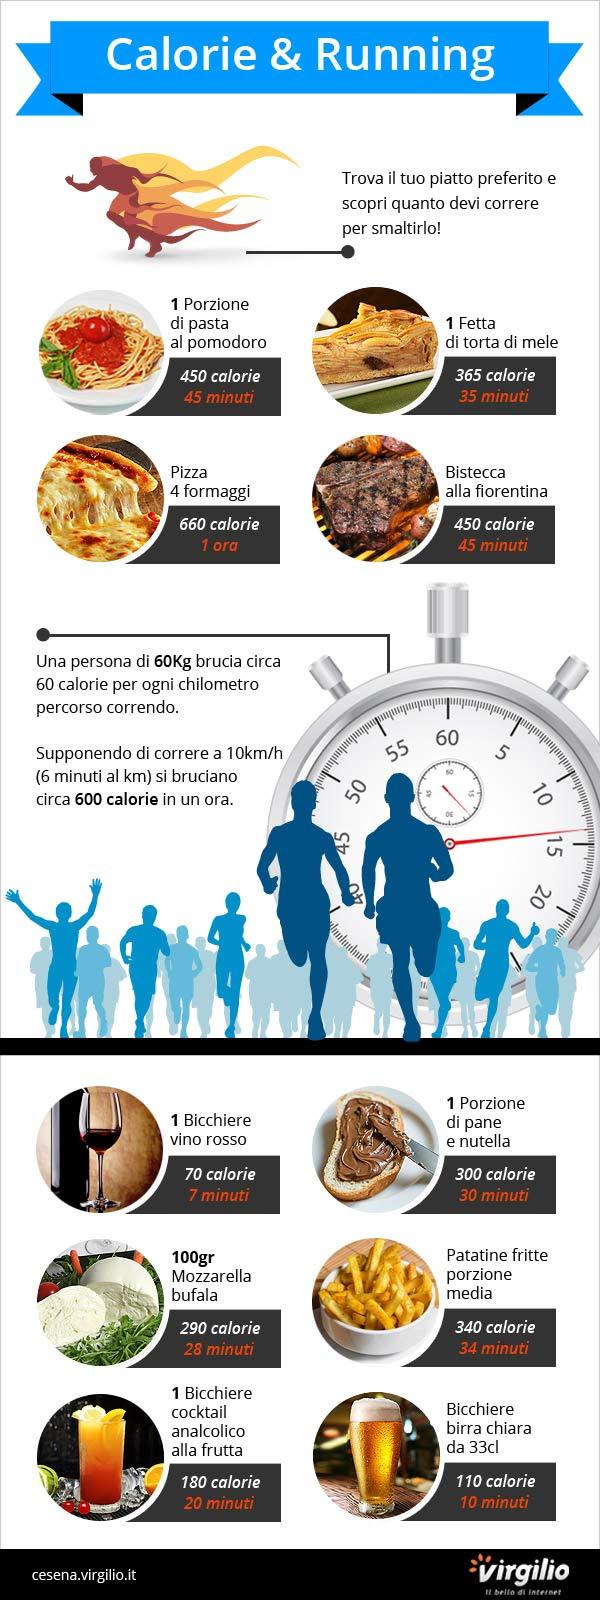 calore e running